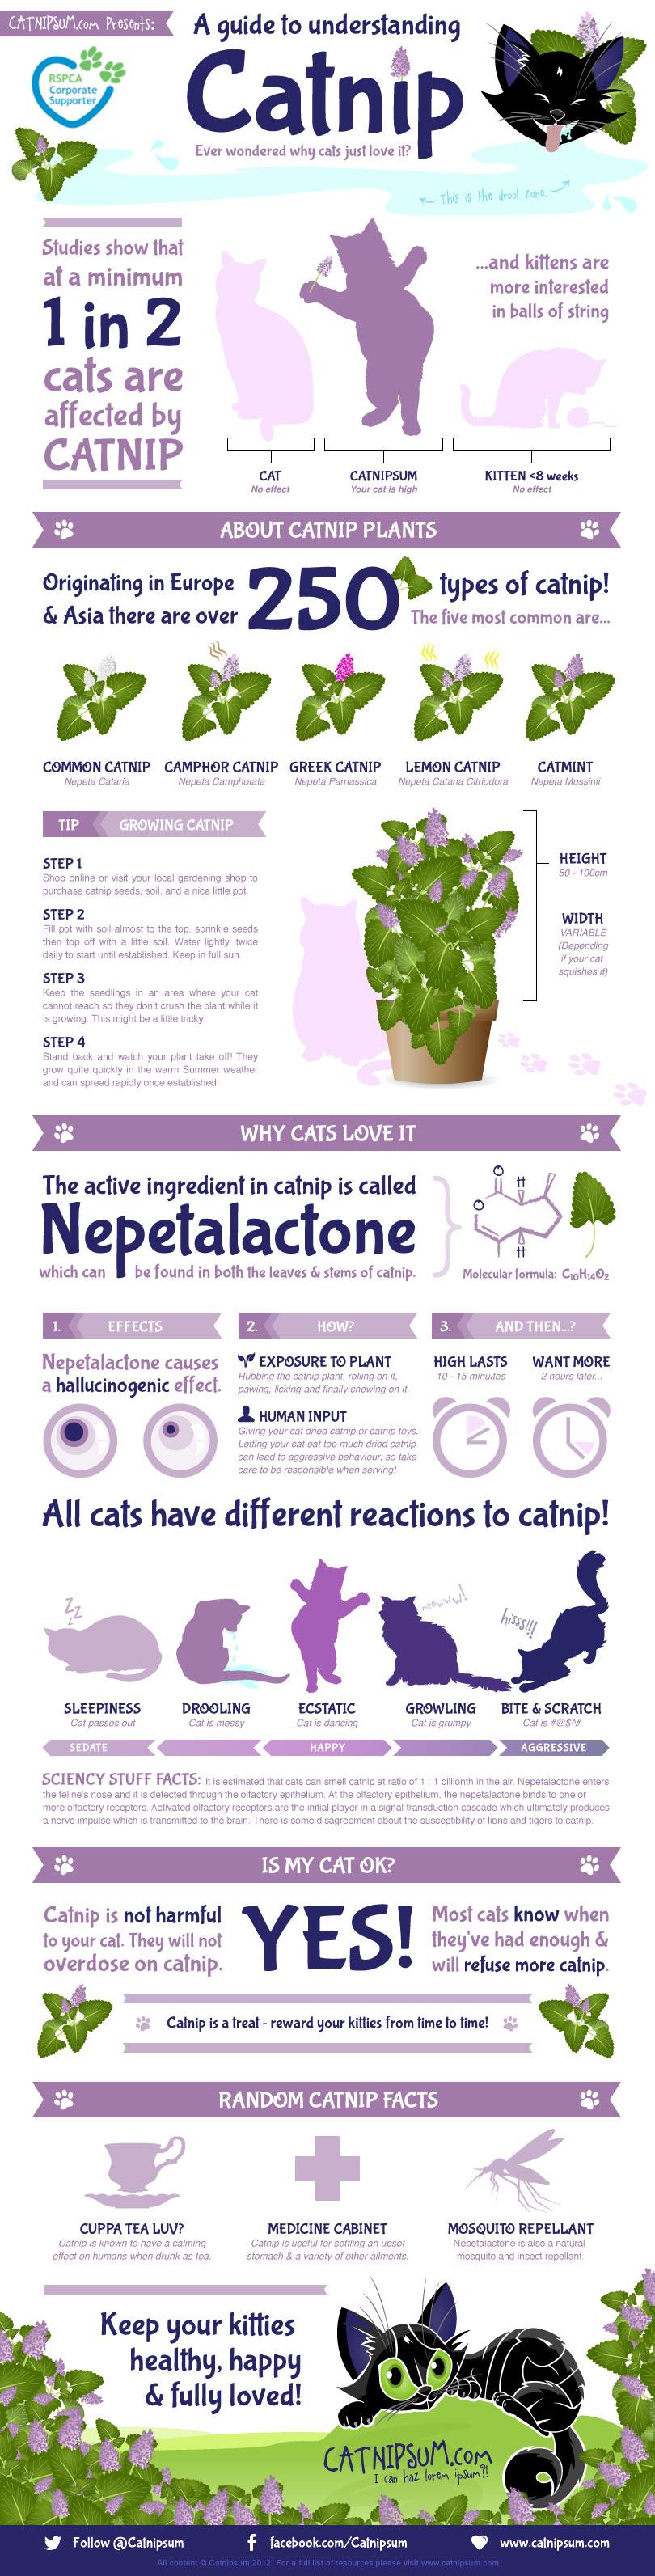 A Guide to Understanding Catnip